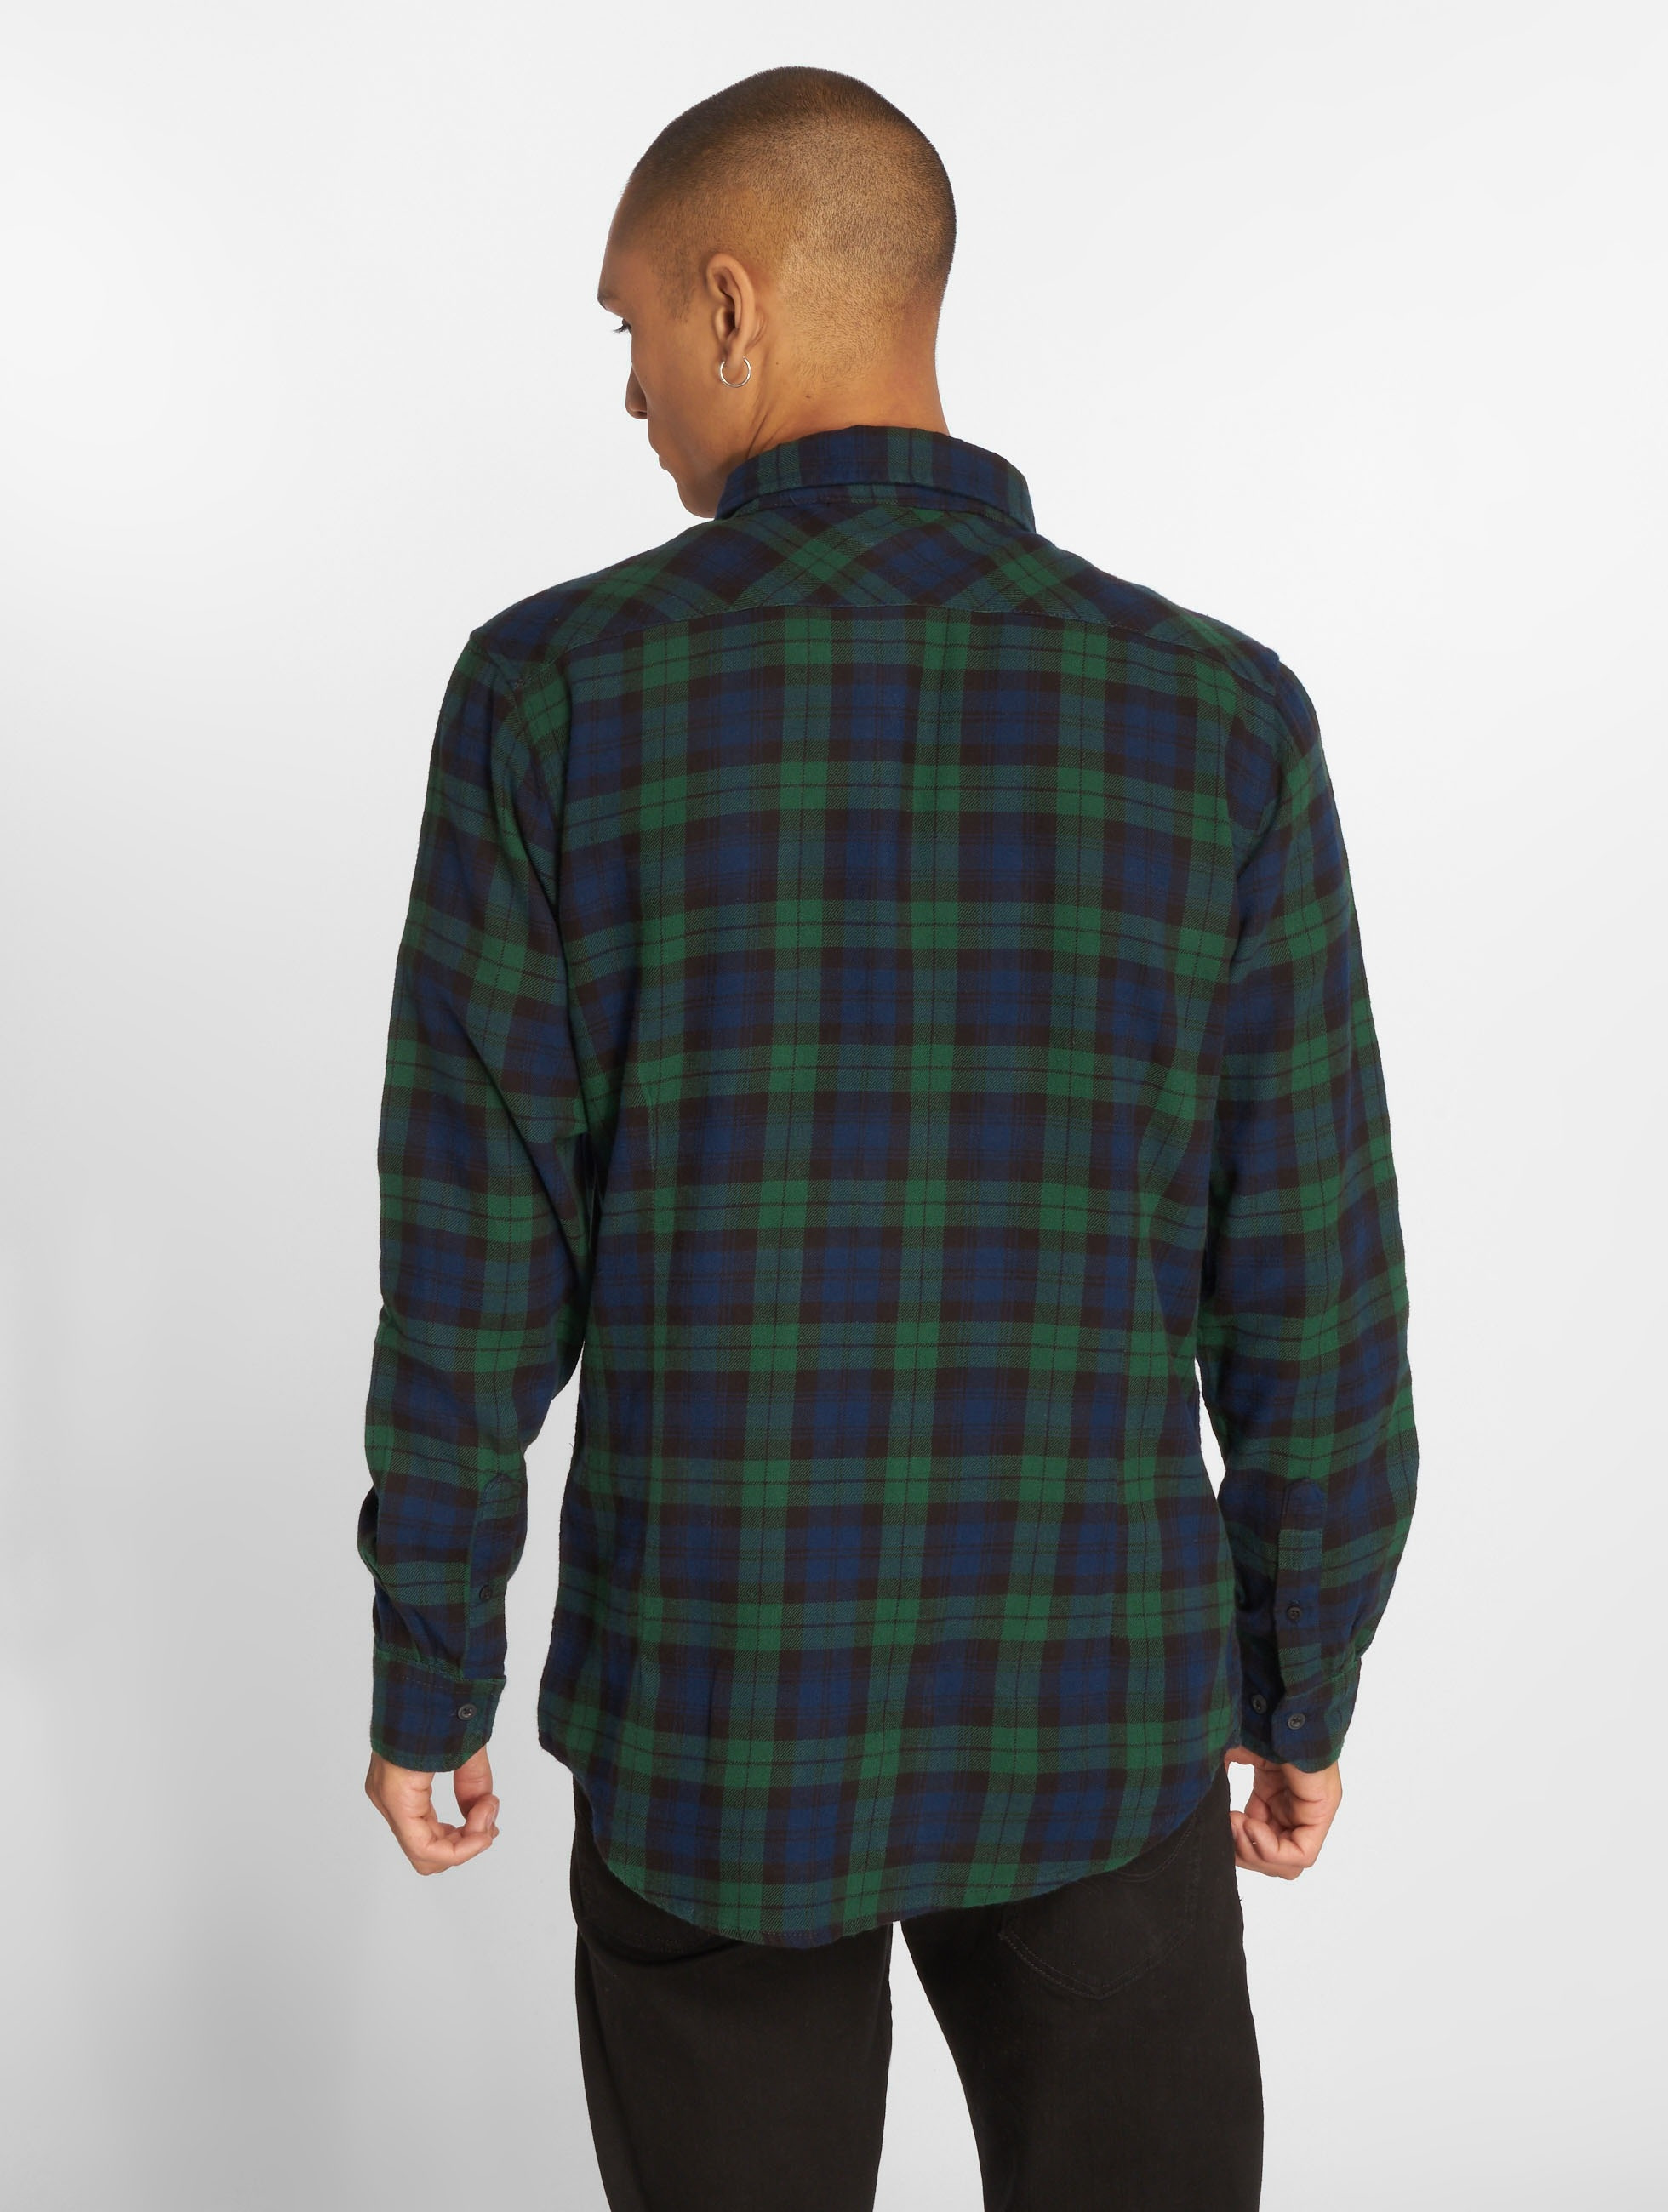 Urban Classics Shirt Checked Flanell 3 blue